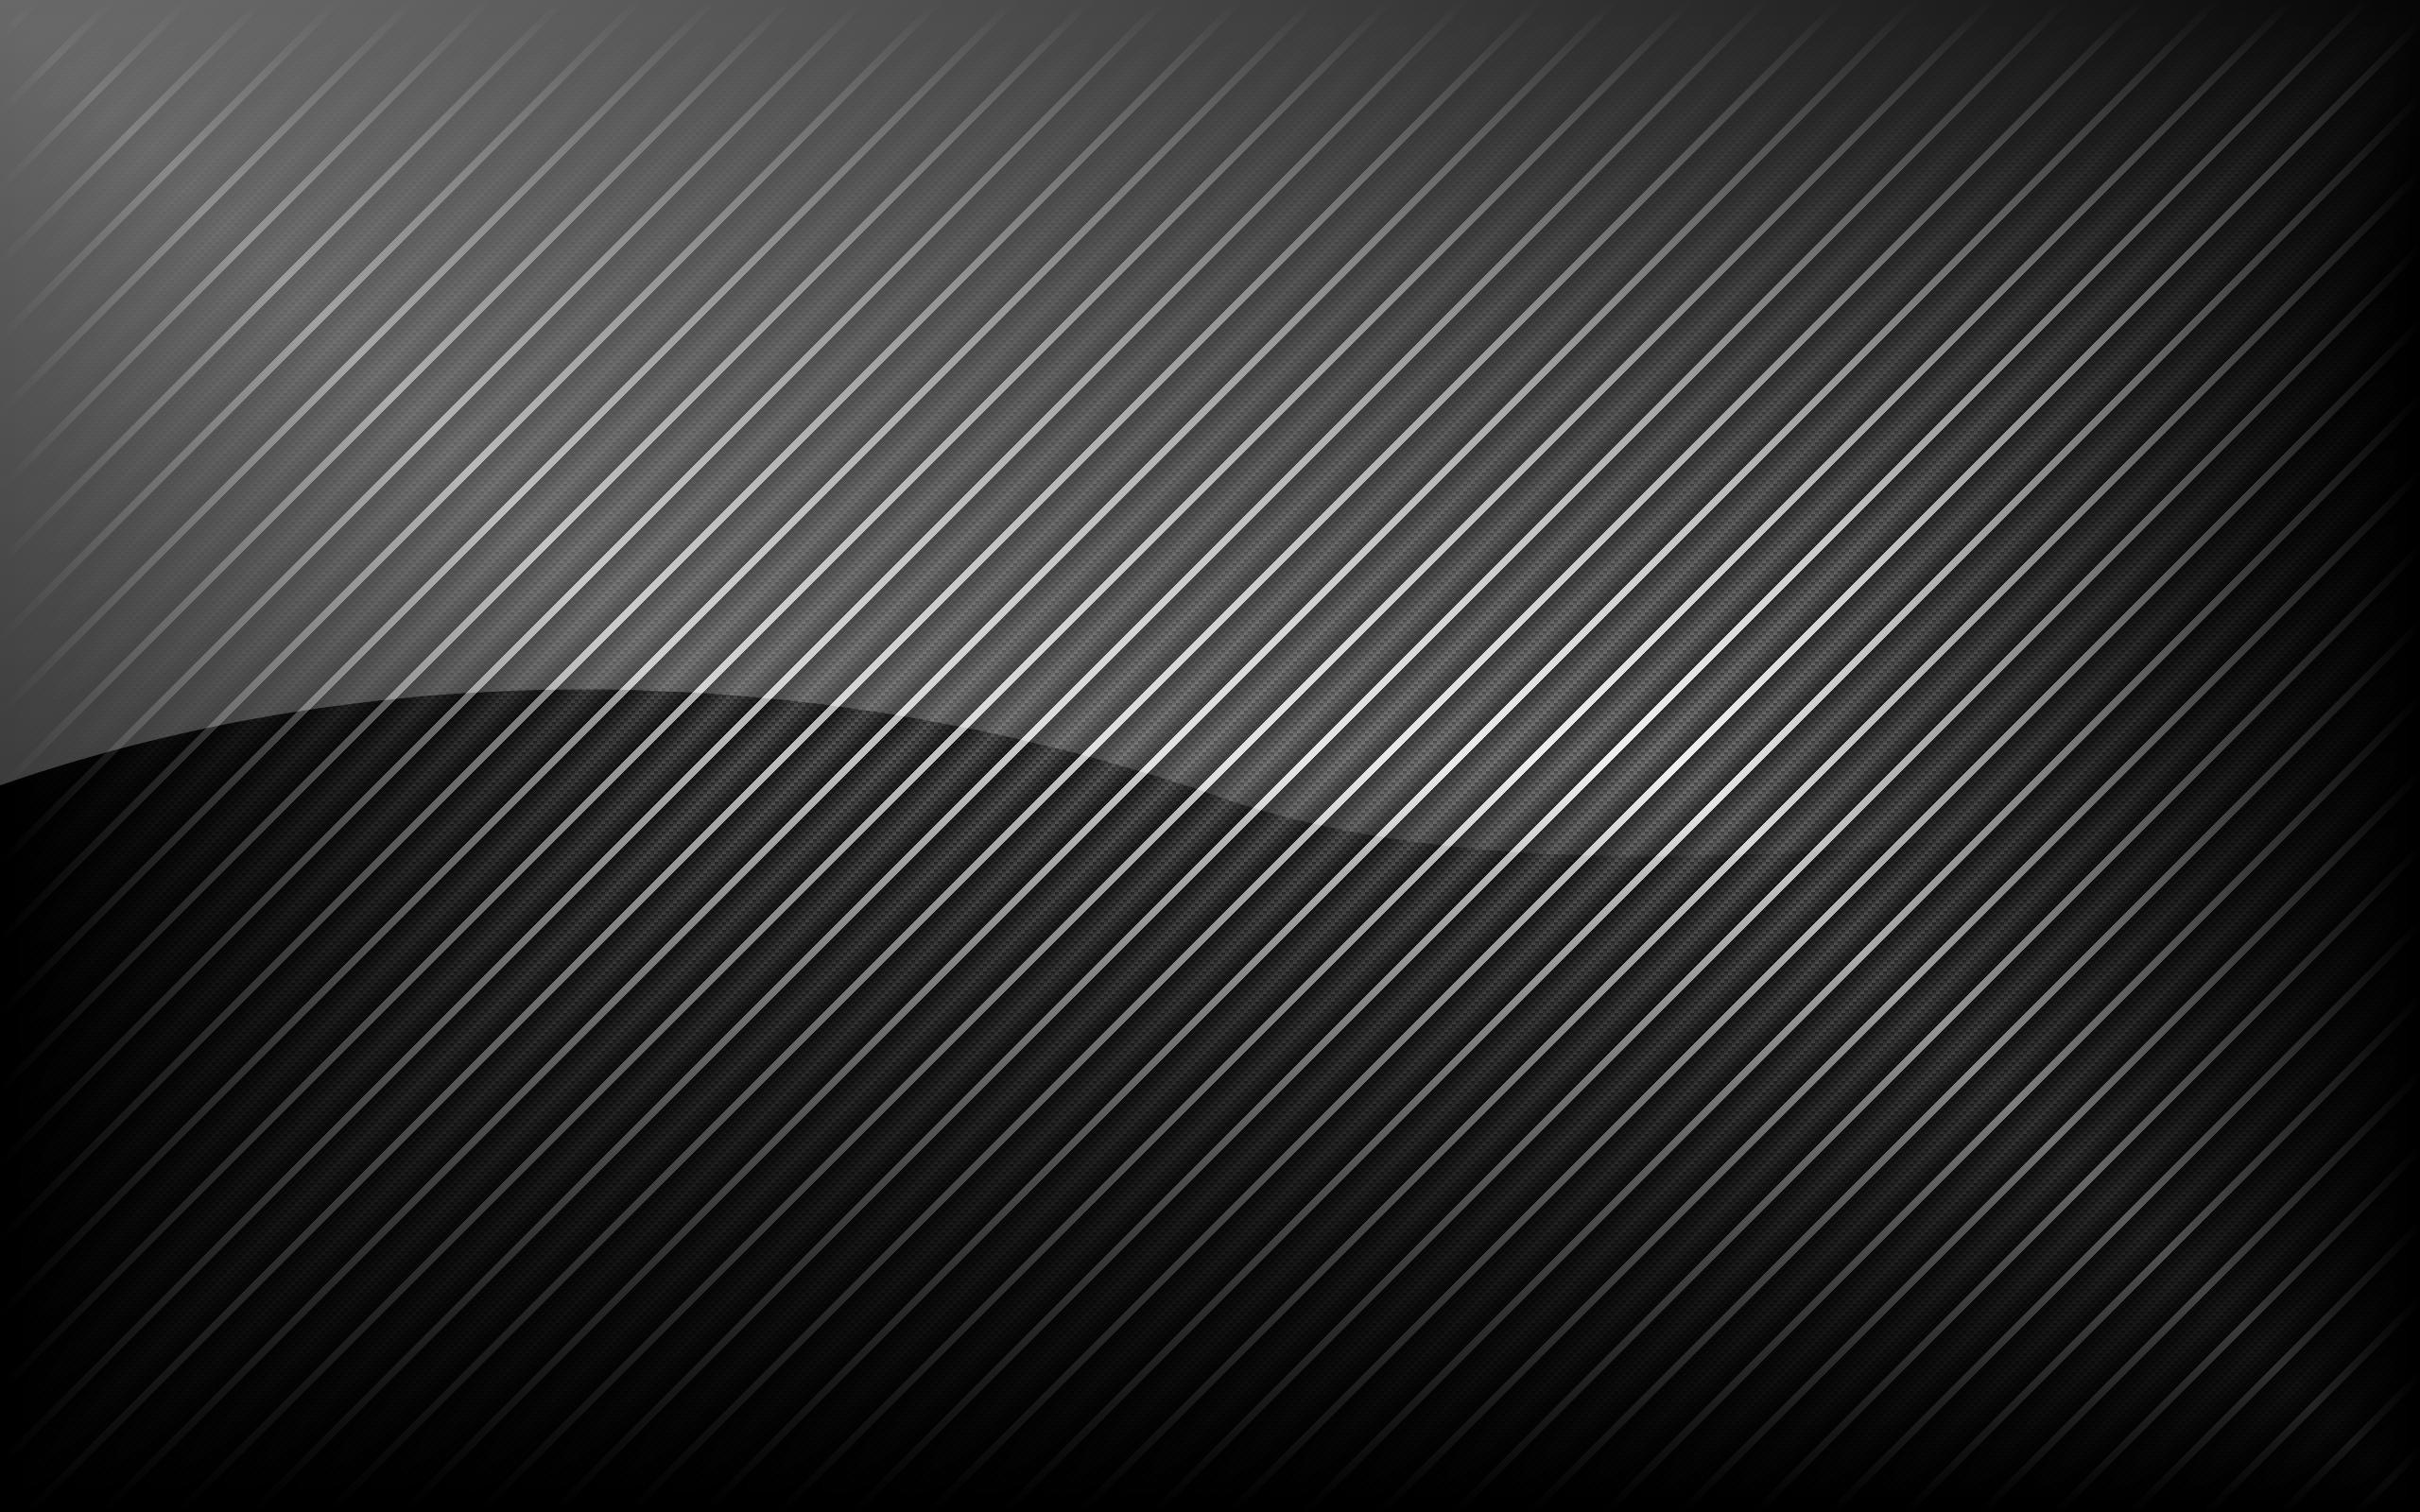 iphone 6 carbon fiber wallpaper (76+ images)